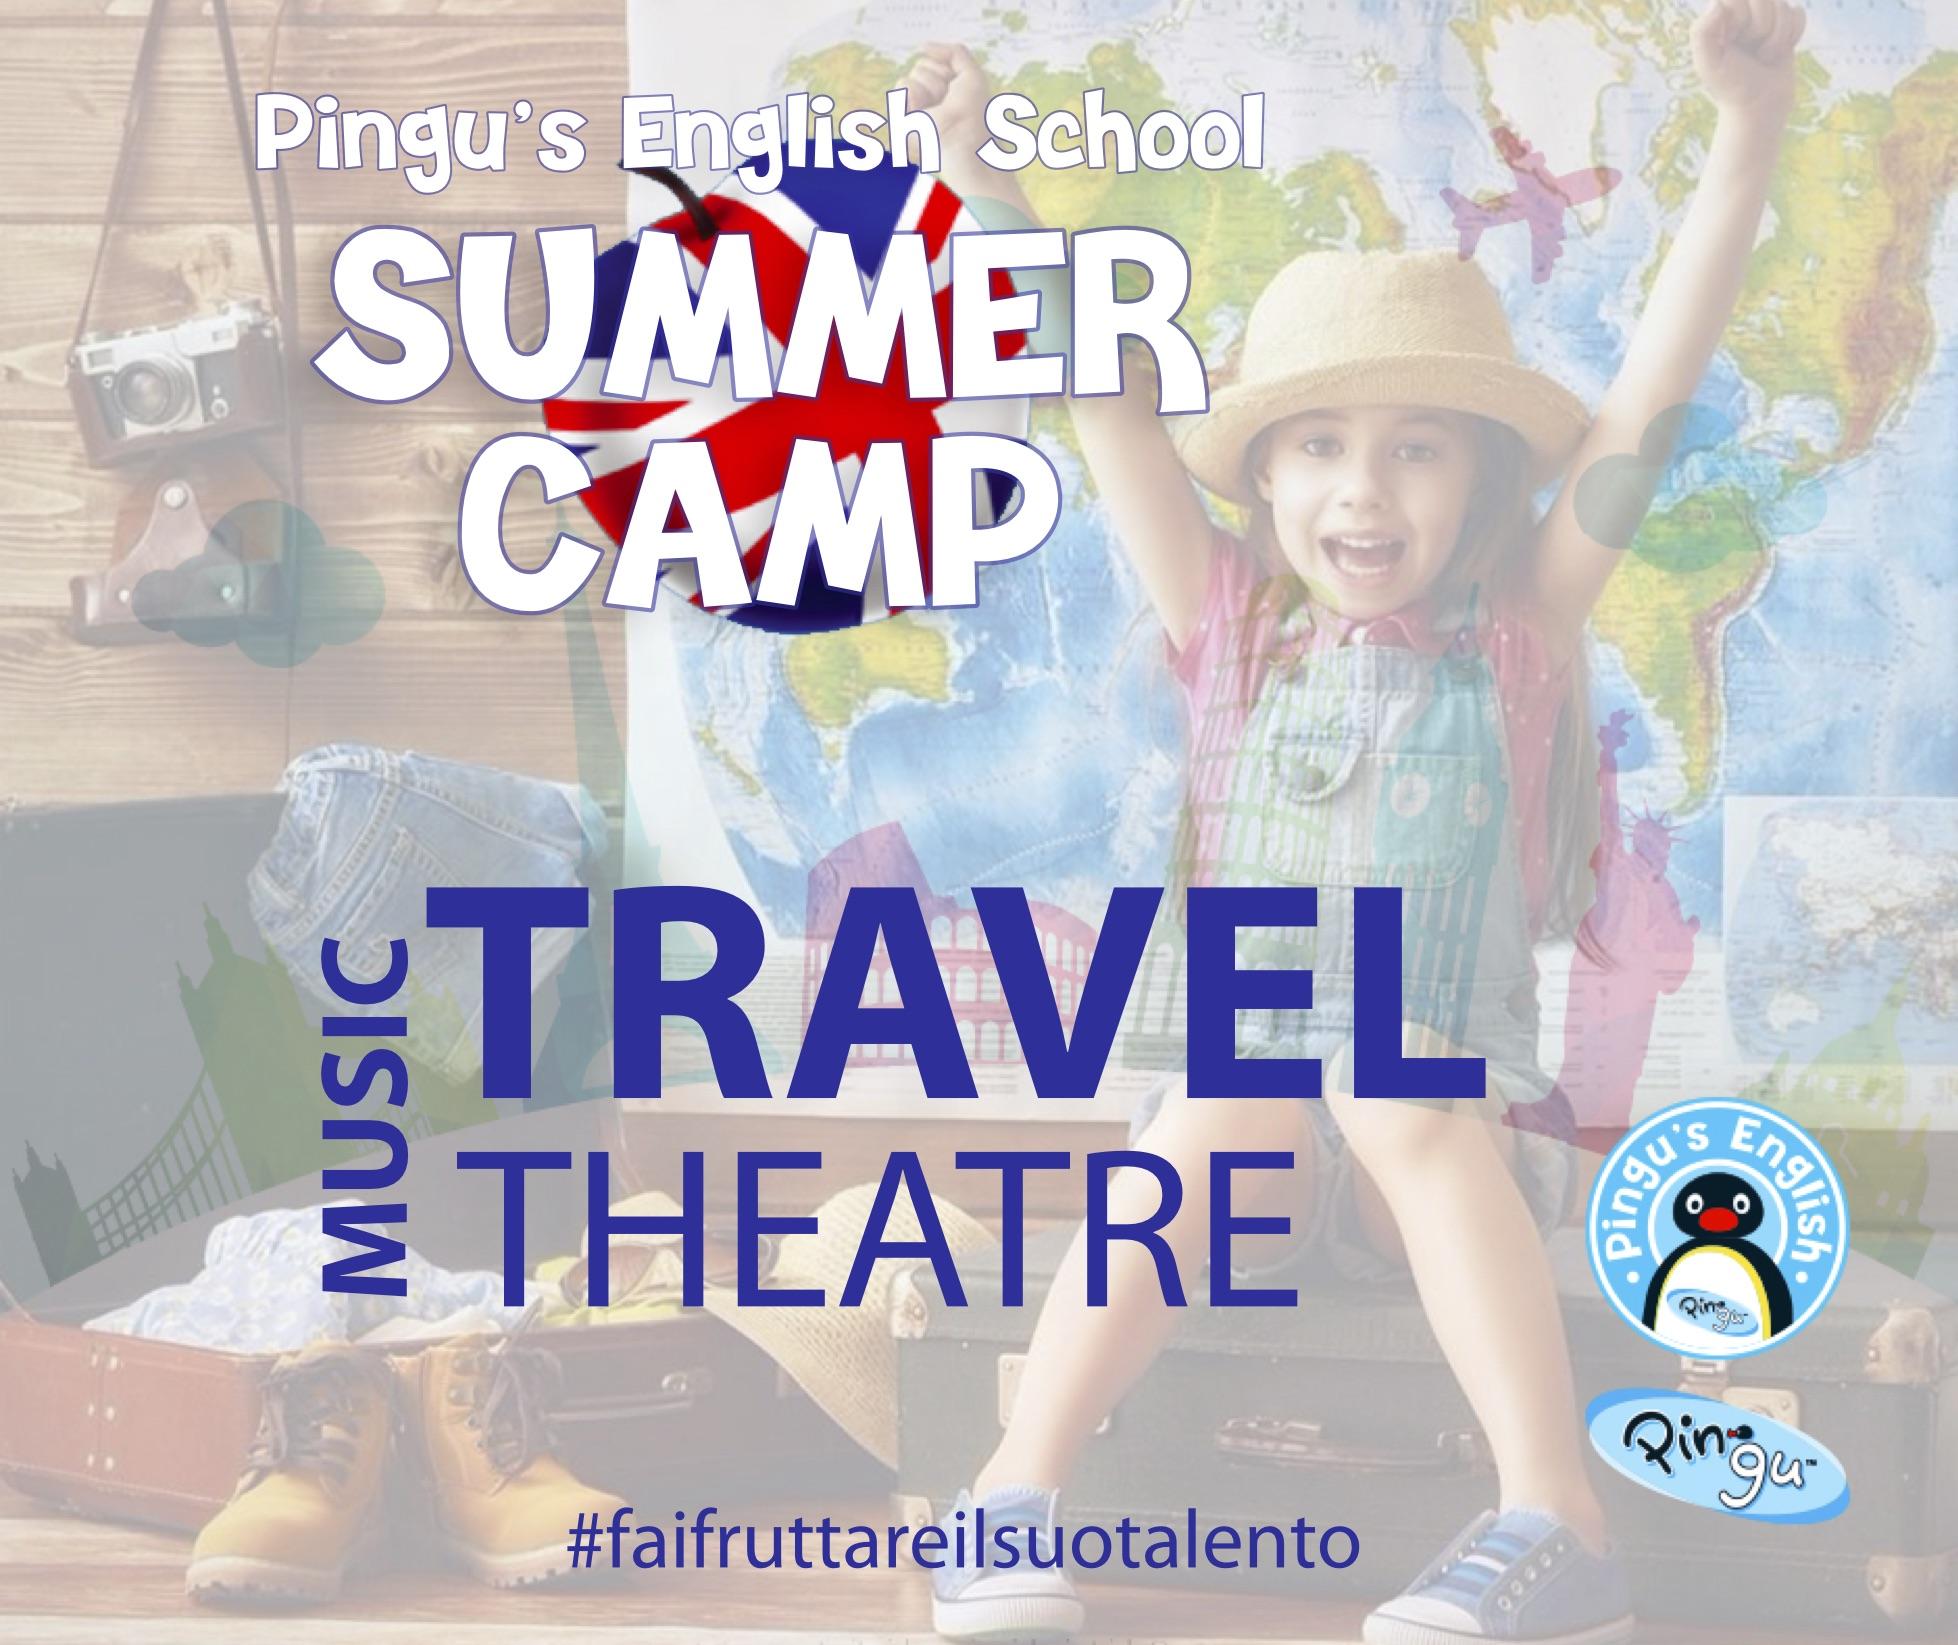 A Modo Mio Melzo summer camp 2019 #faifruttareilsuotalento - pingu's english